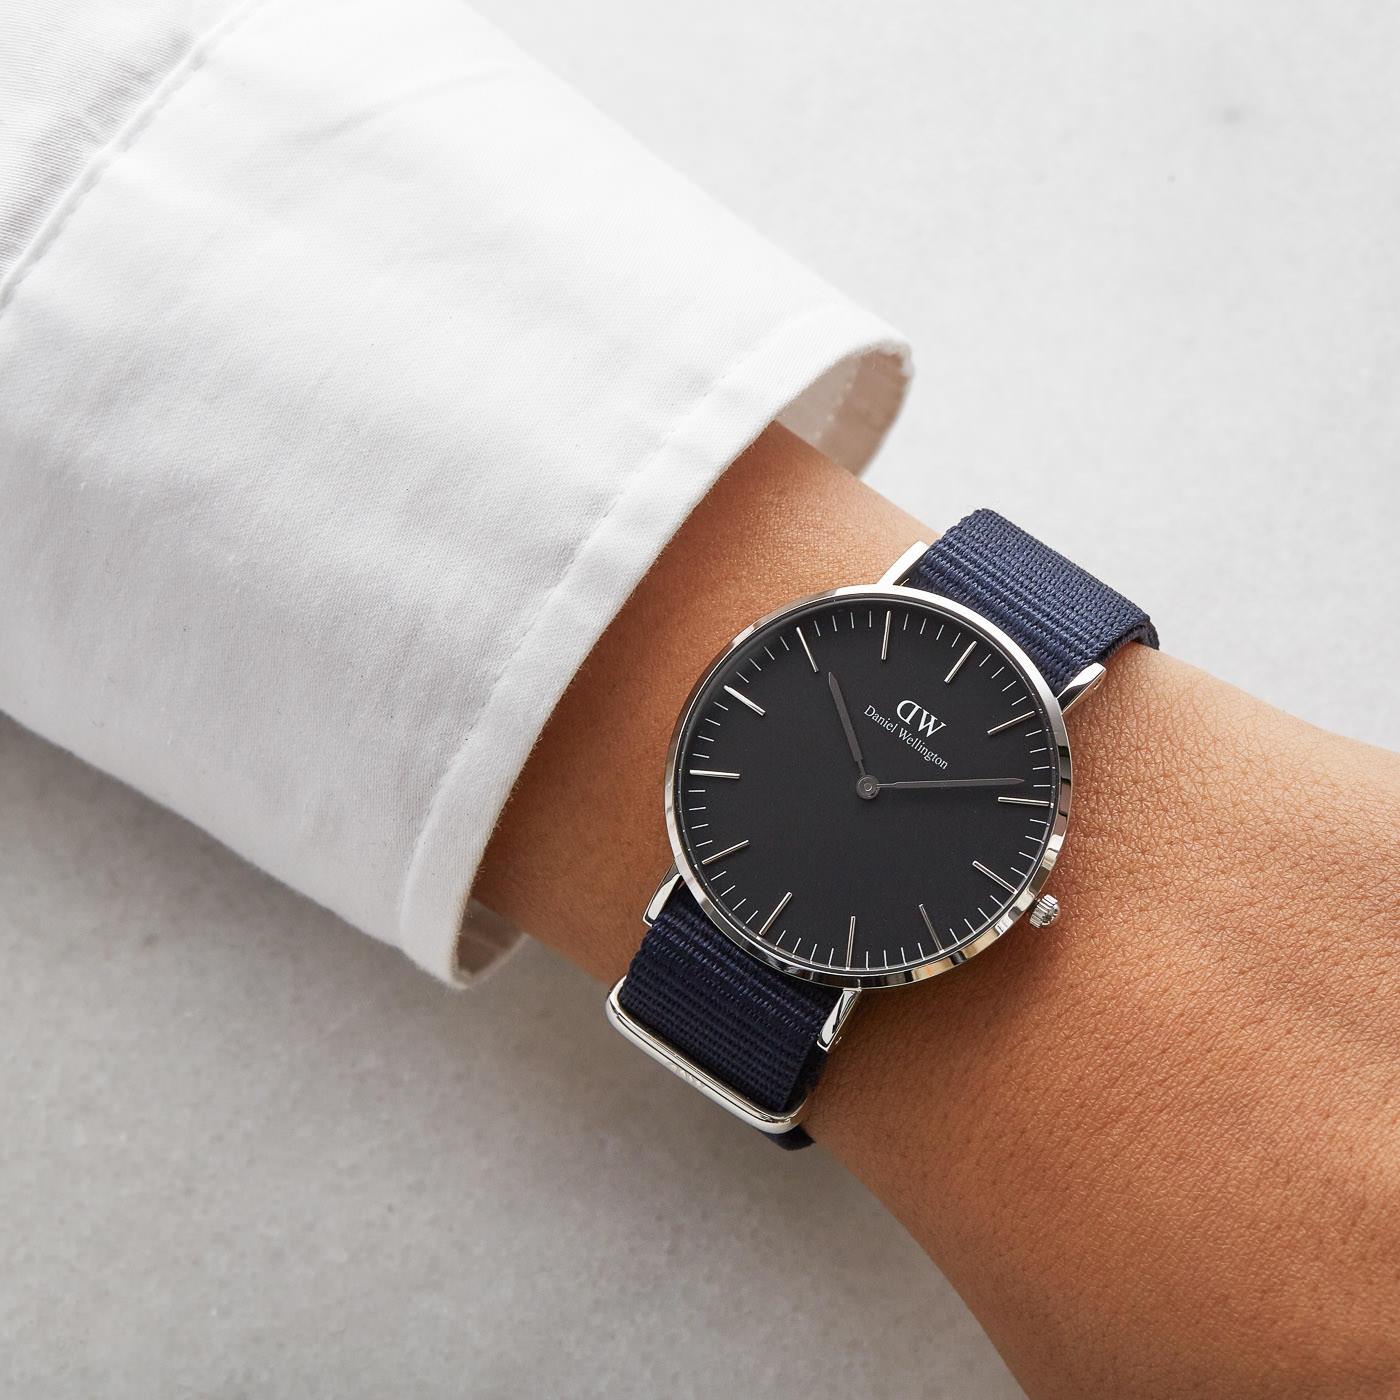 8492b2287455 Daniel Wellington Classic watch DW00100282 - Watches